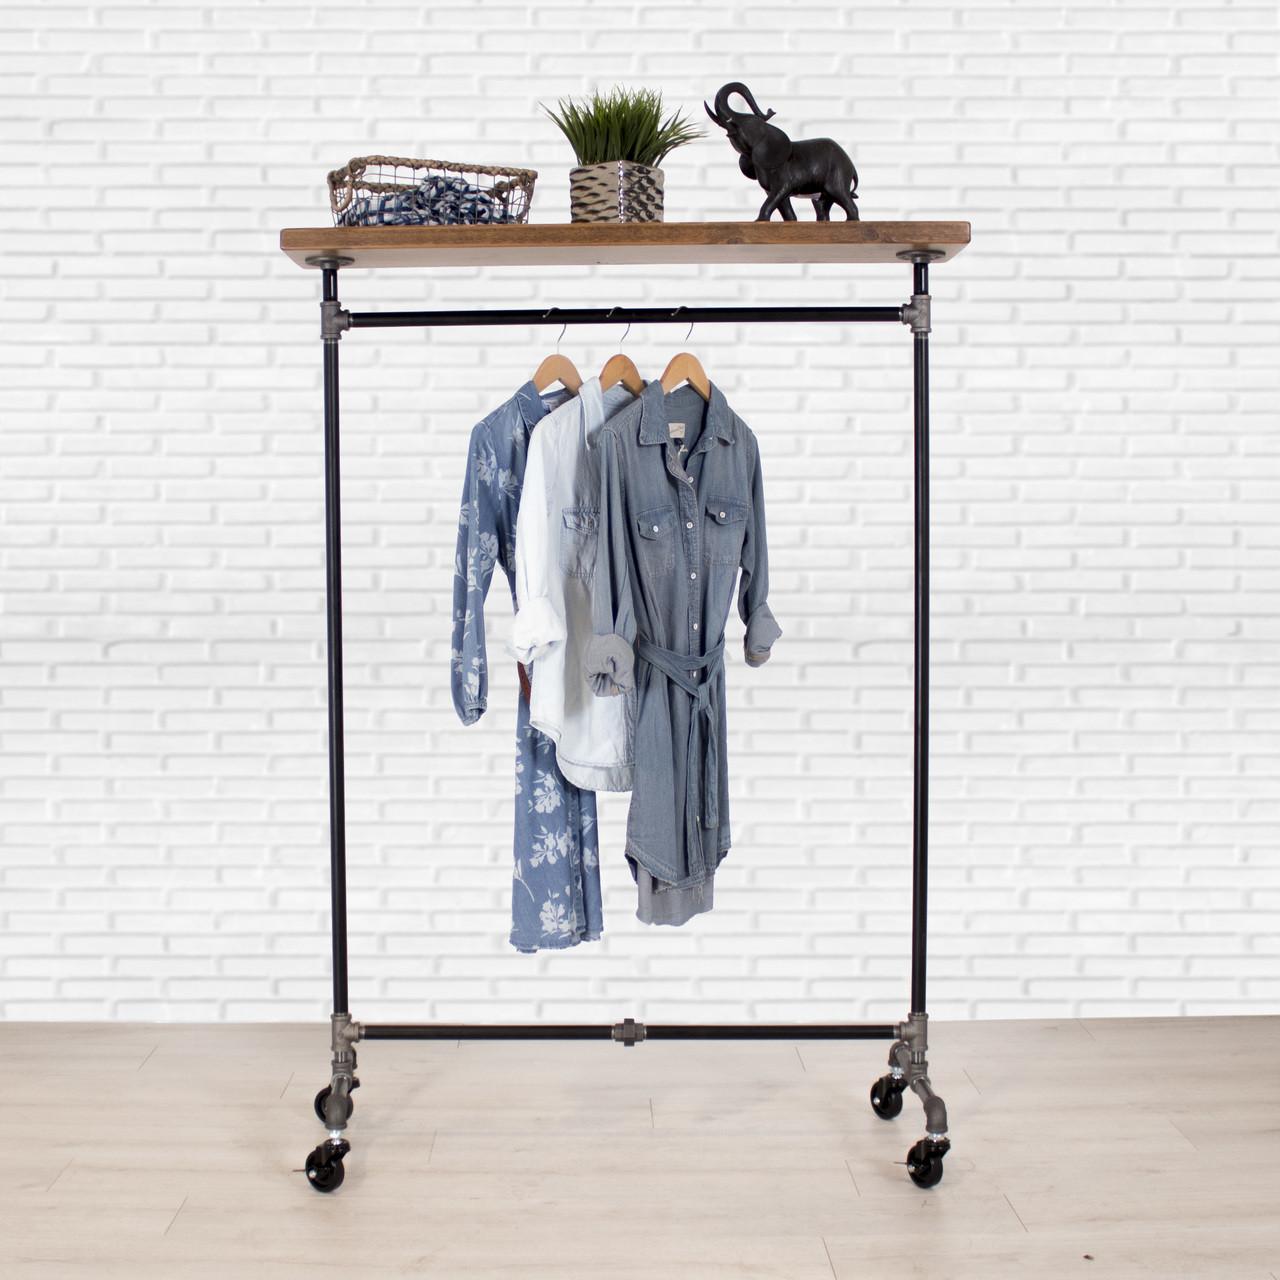 rack chrome pipe steel b reader extend sil adjustable stainless metal portable black garment in wardrobes n garmrack storage clothing mind organization closet racks